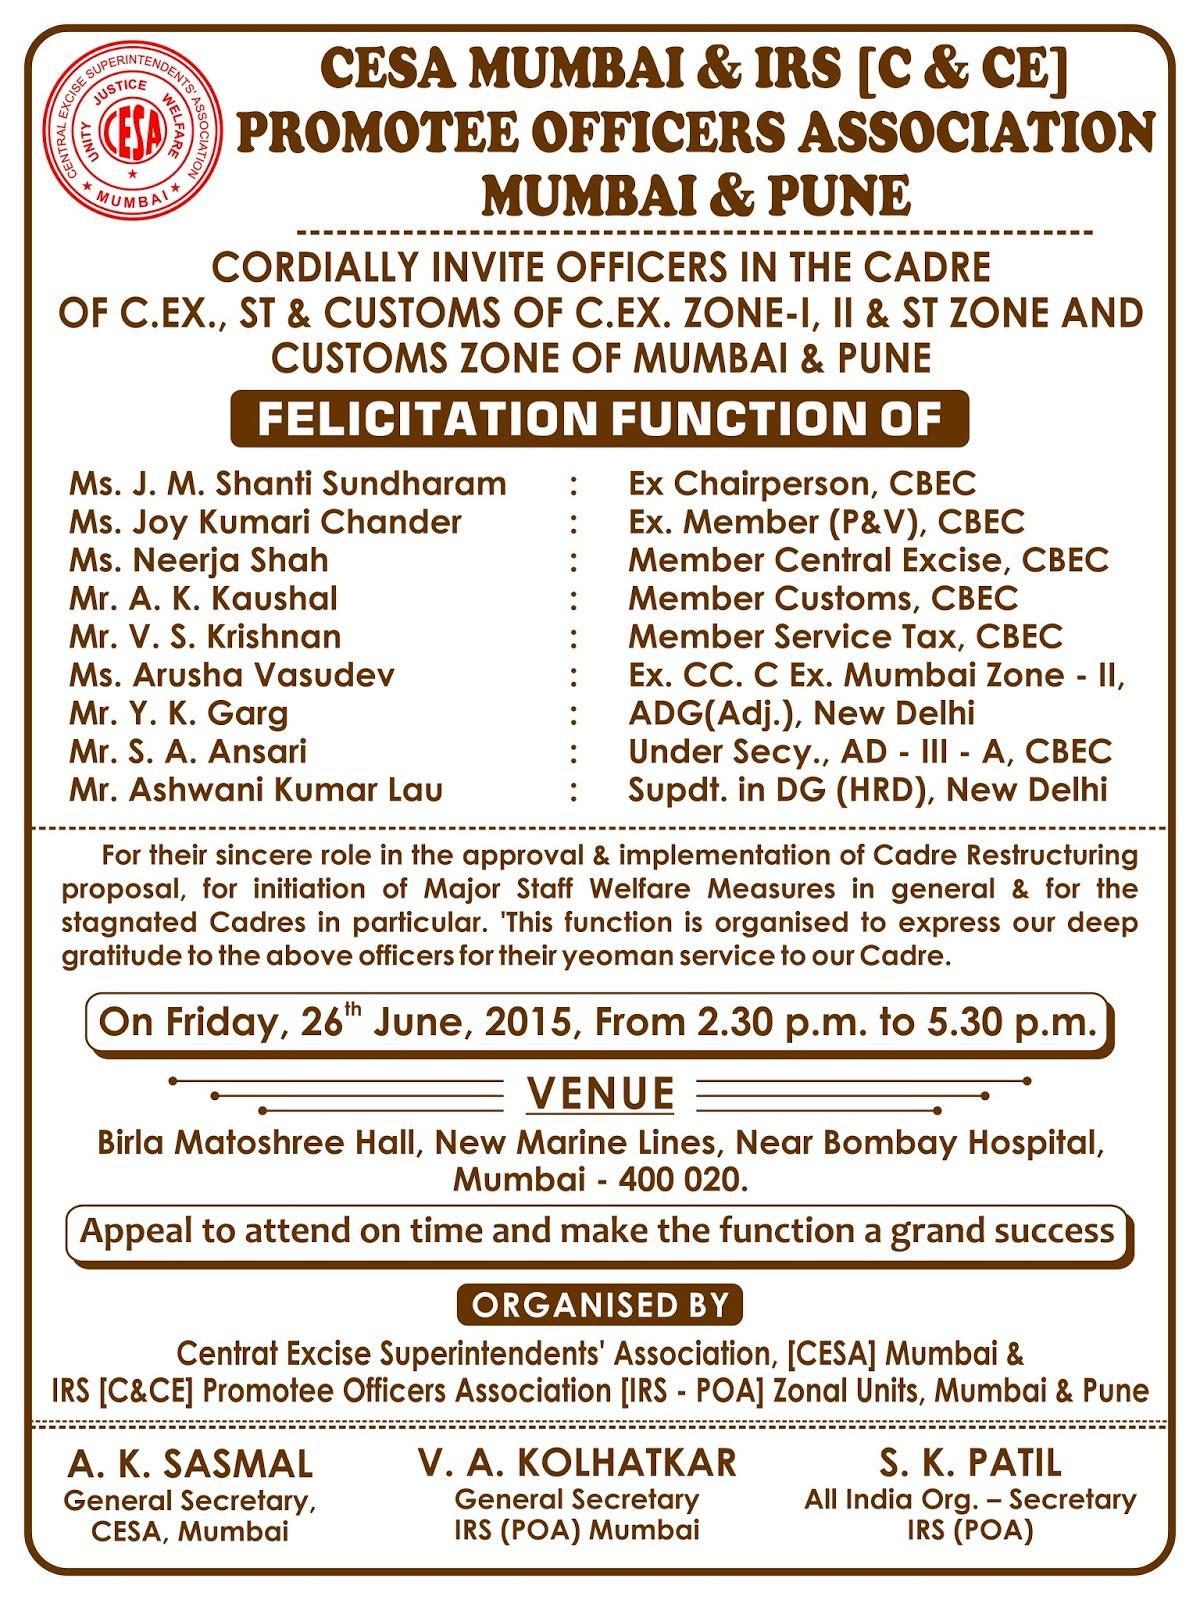 CESA MUMBAI OPEN INVITATION FOR FELICITATION FUNCTION